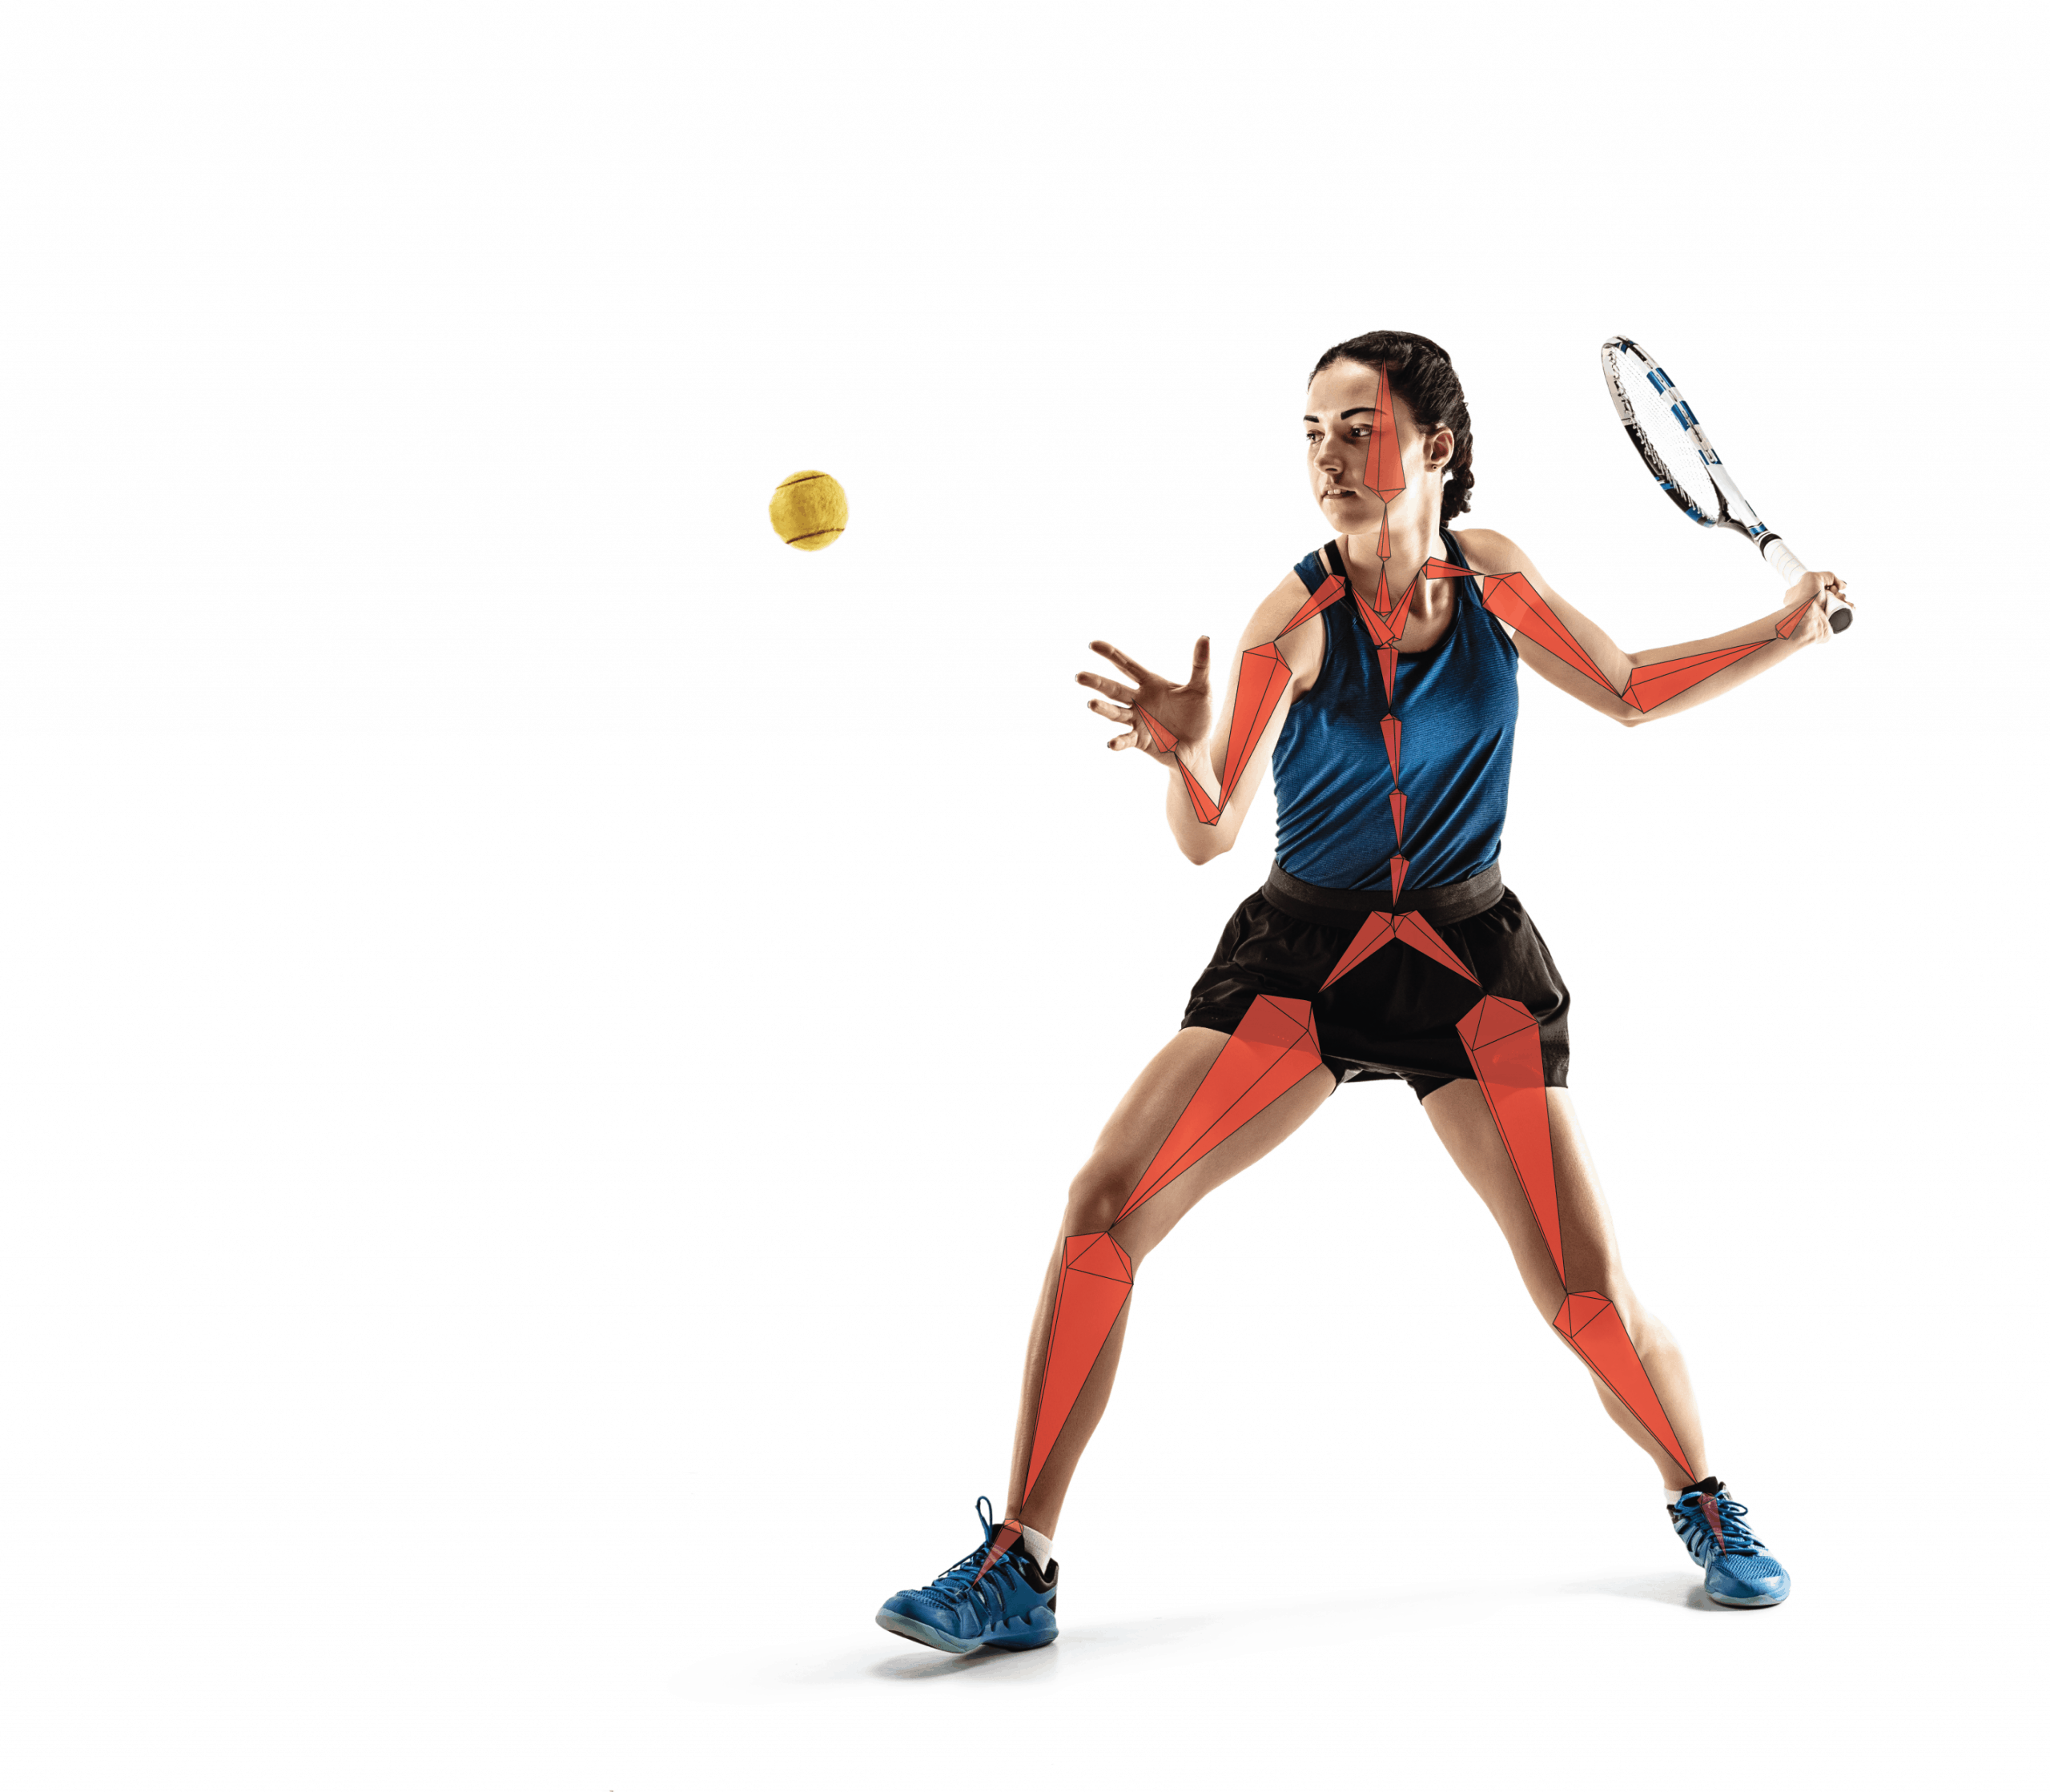 tennis player motion capture skeleton